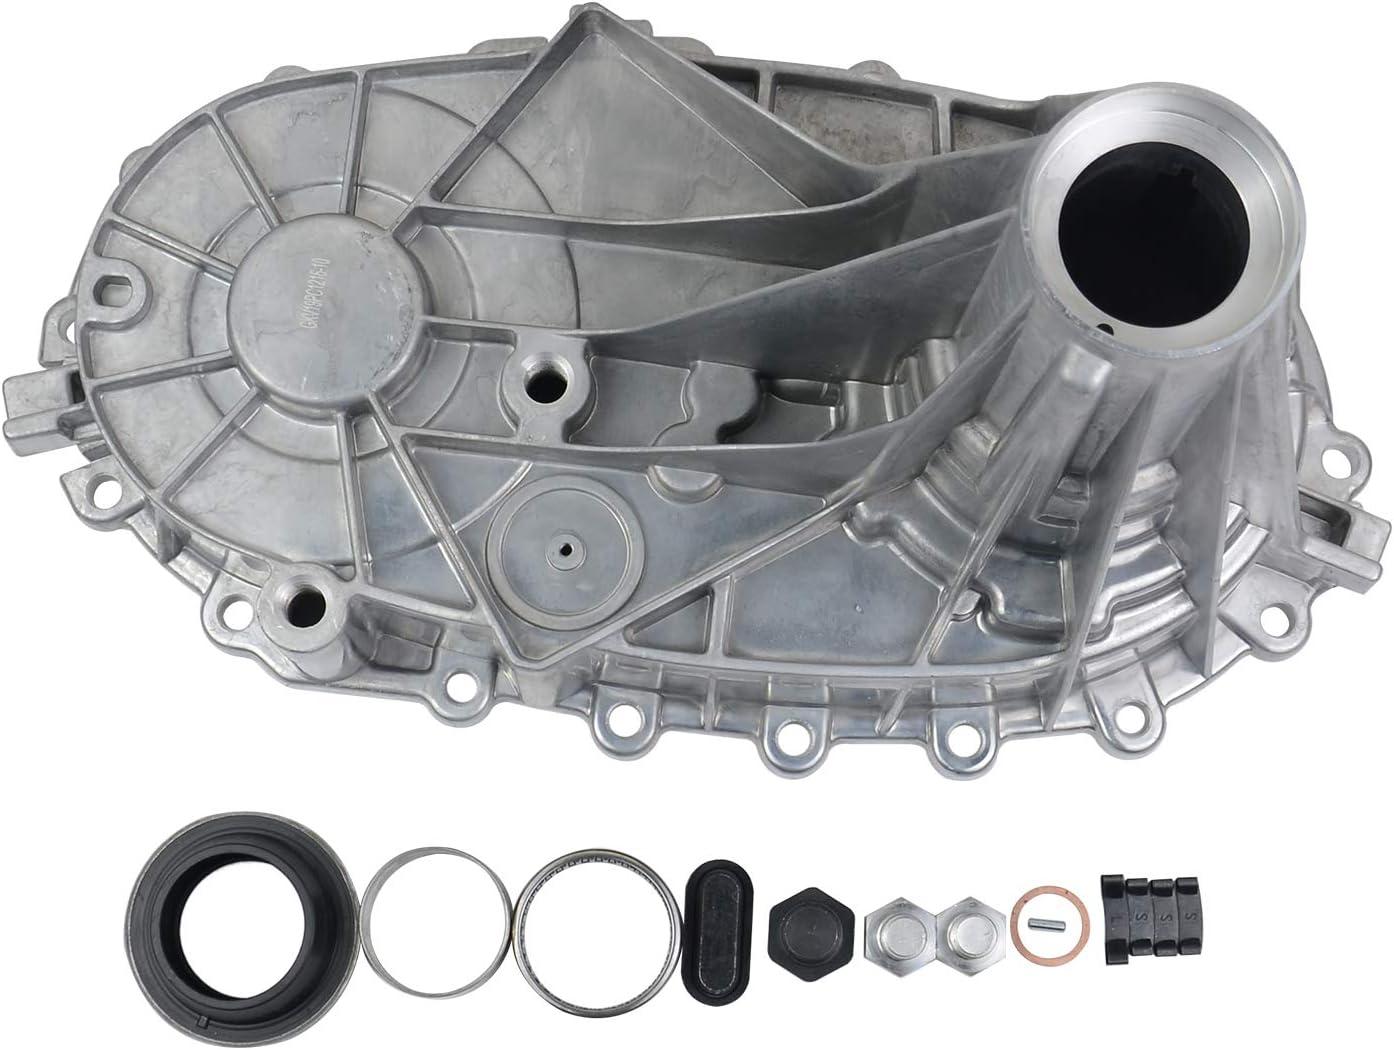 GELUOXI Rear Half Part of Car Transfer Case 12478092 600-562 Compatible for GMC Sierra Chevy Silverado 2500//3500 6.0L-8.1L